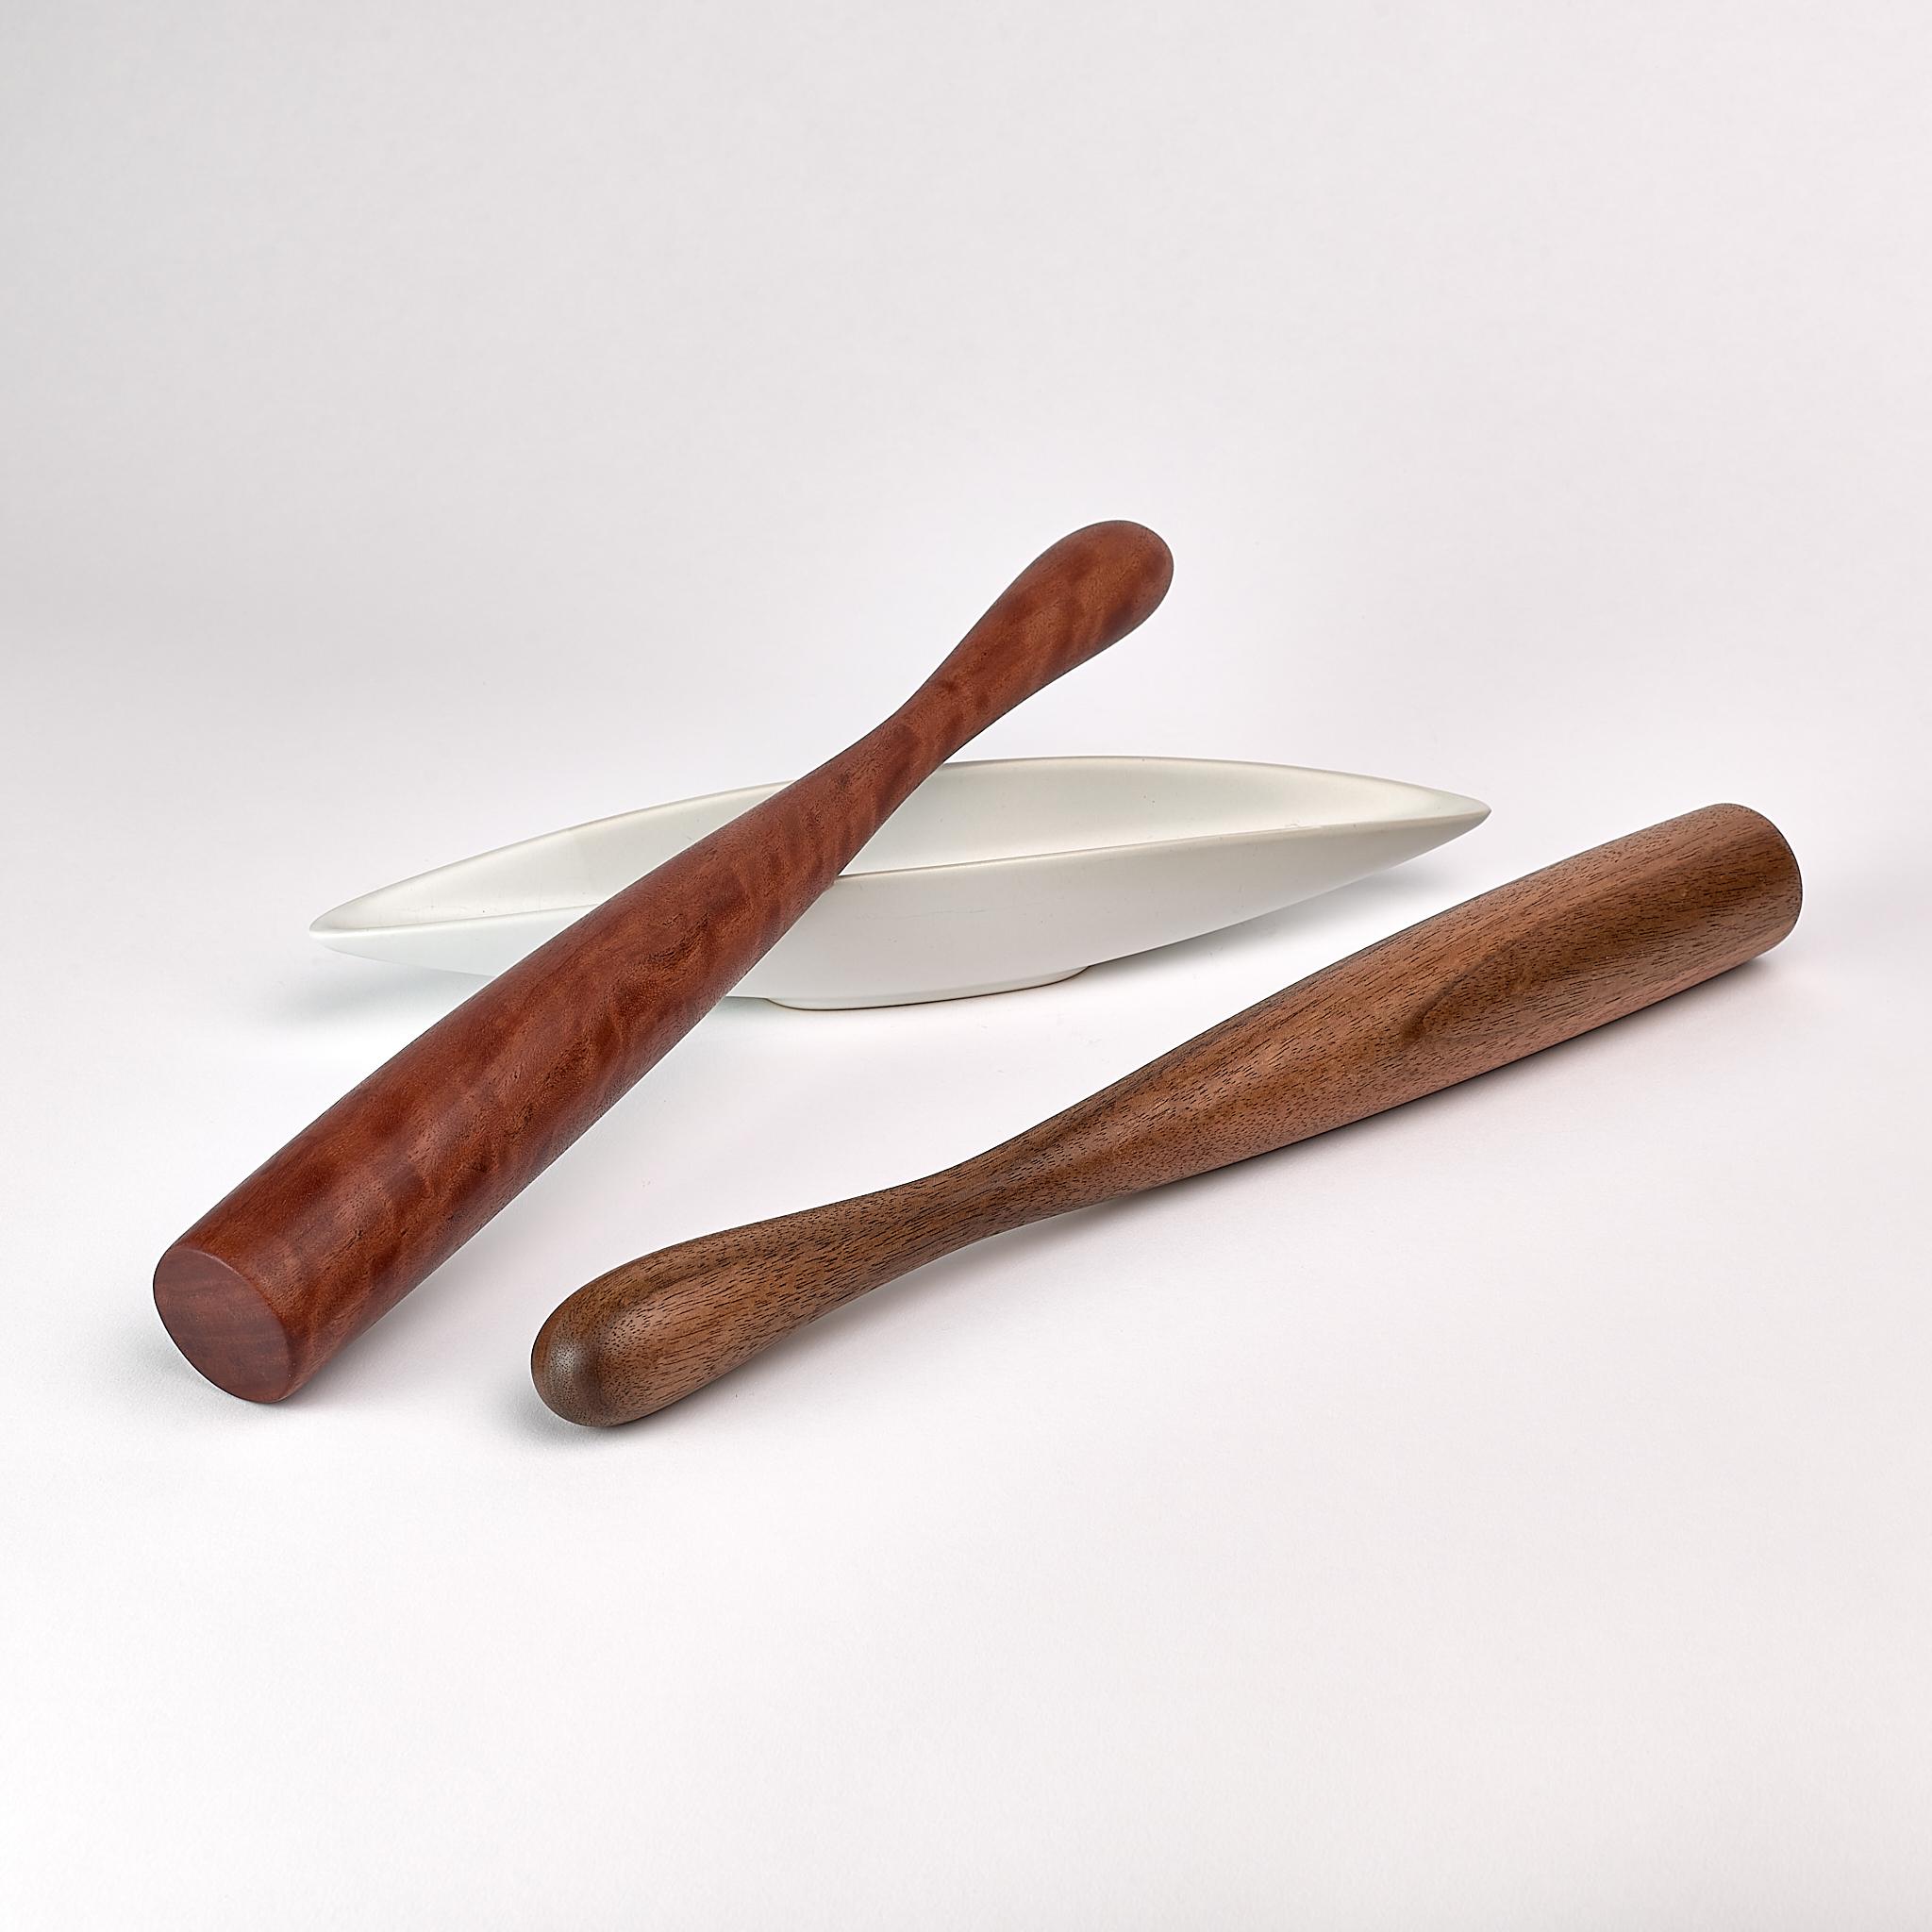 muddler 3640 - large muddler muddle stick handmade by Bob Gilmour, Gilmour Design, Auastralia